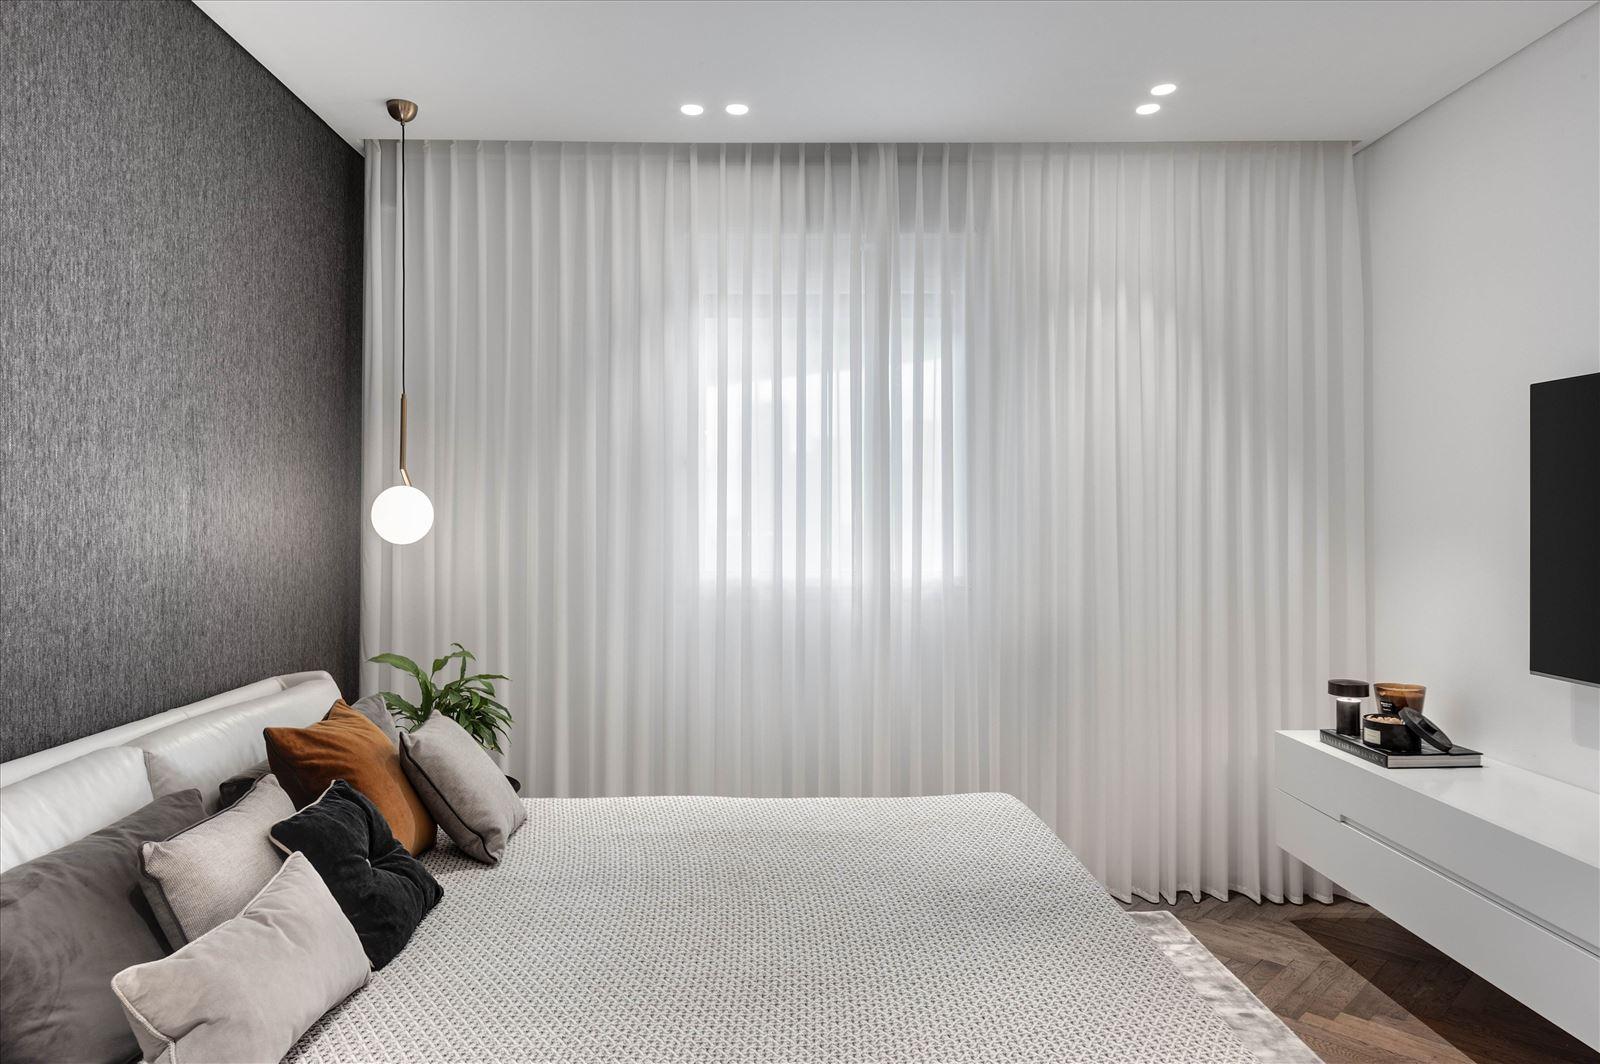 Duplex lighting - תאורת חדר שינה על ידי דורי קמחי